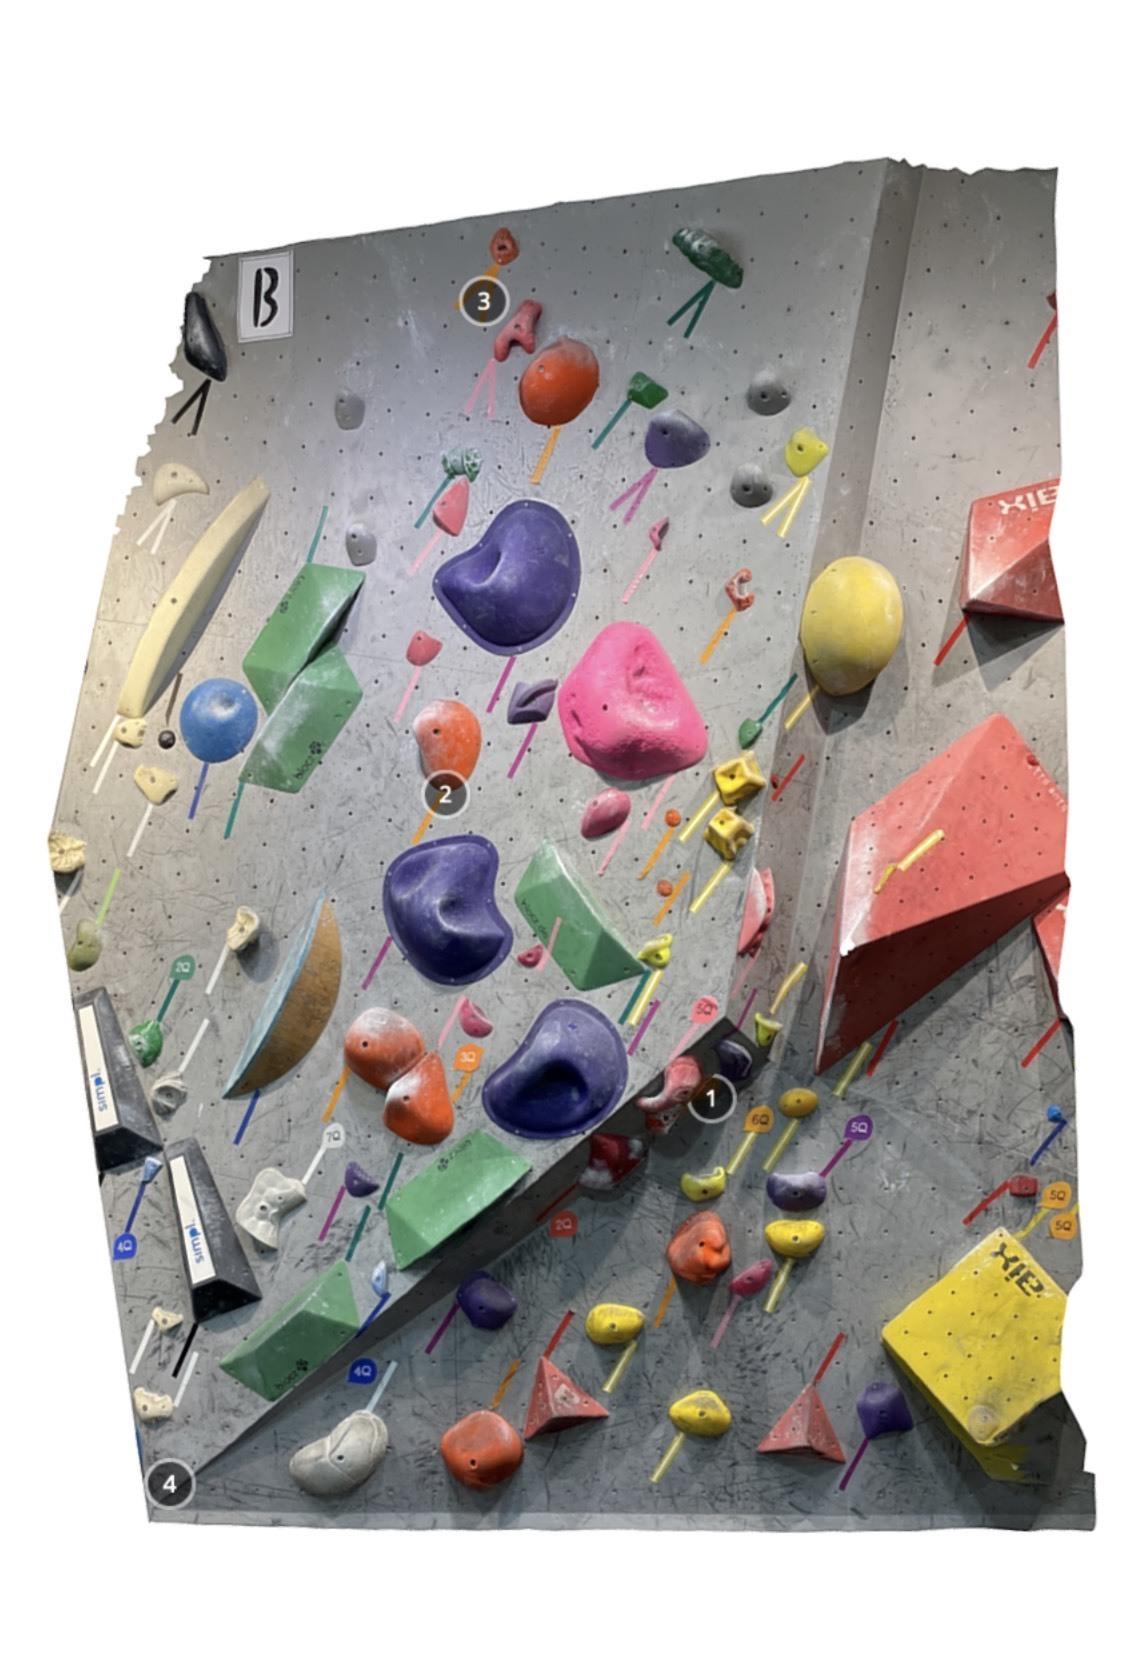 DOGWOOD Climbing Gym Chofu 3Q